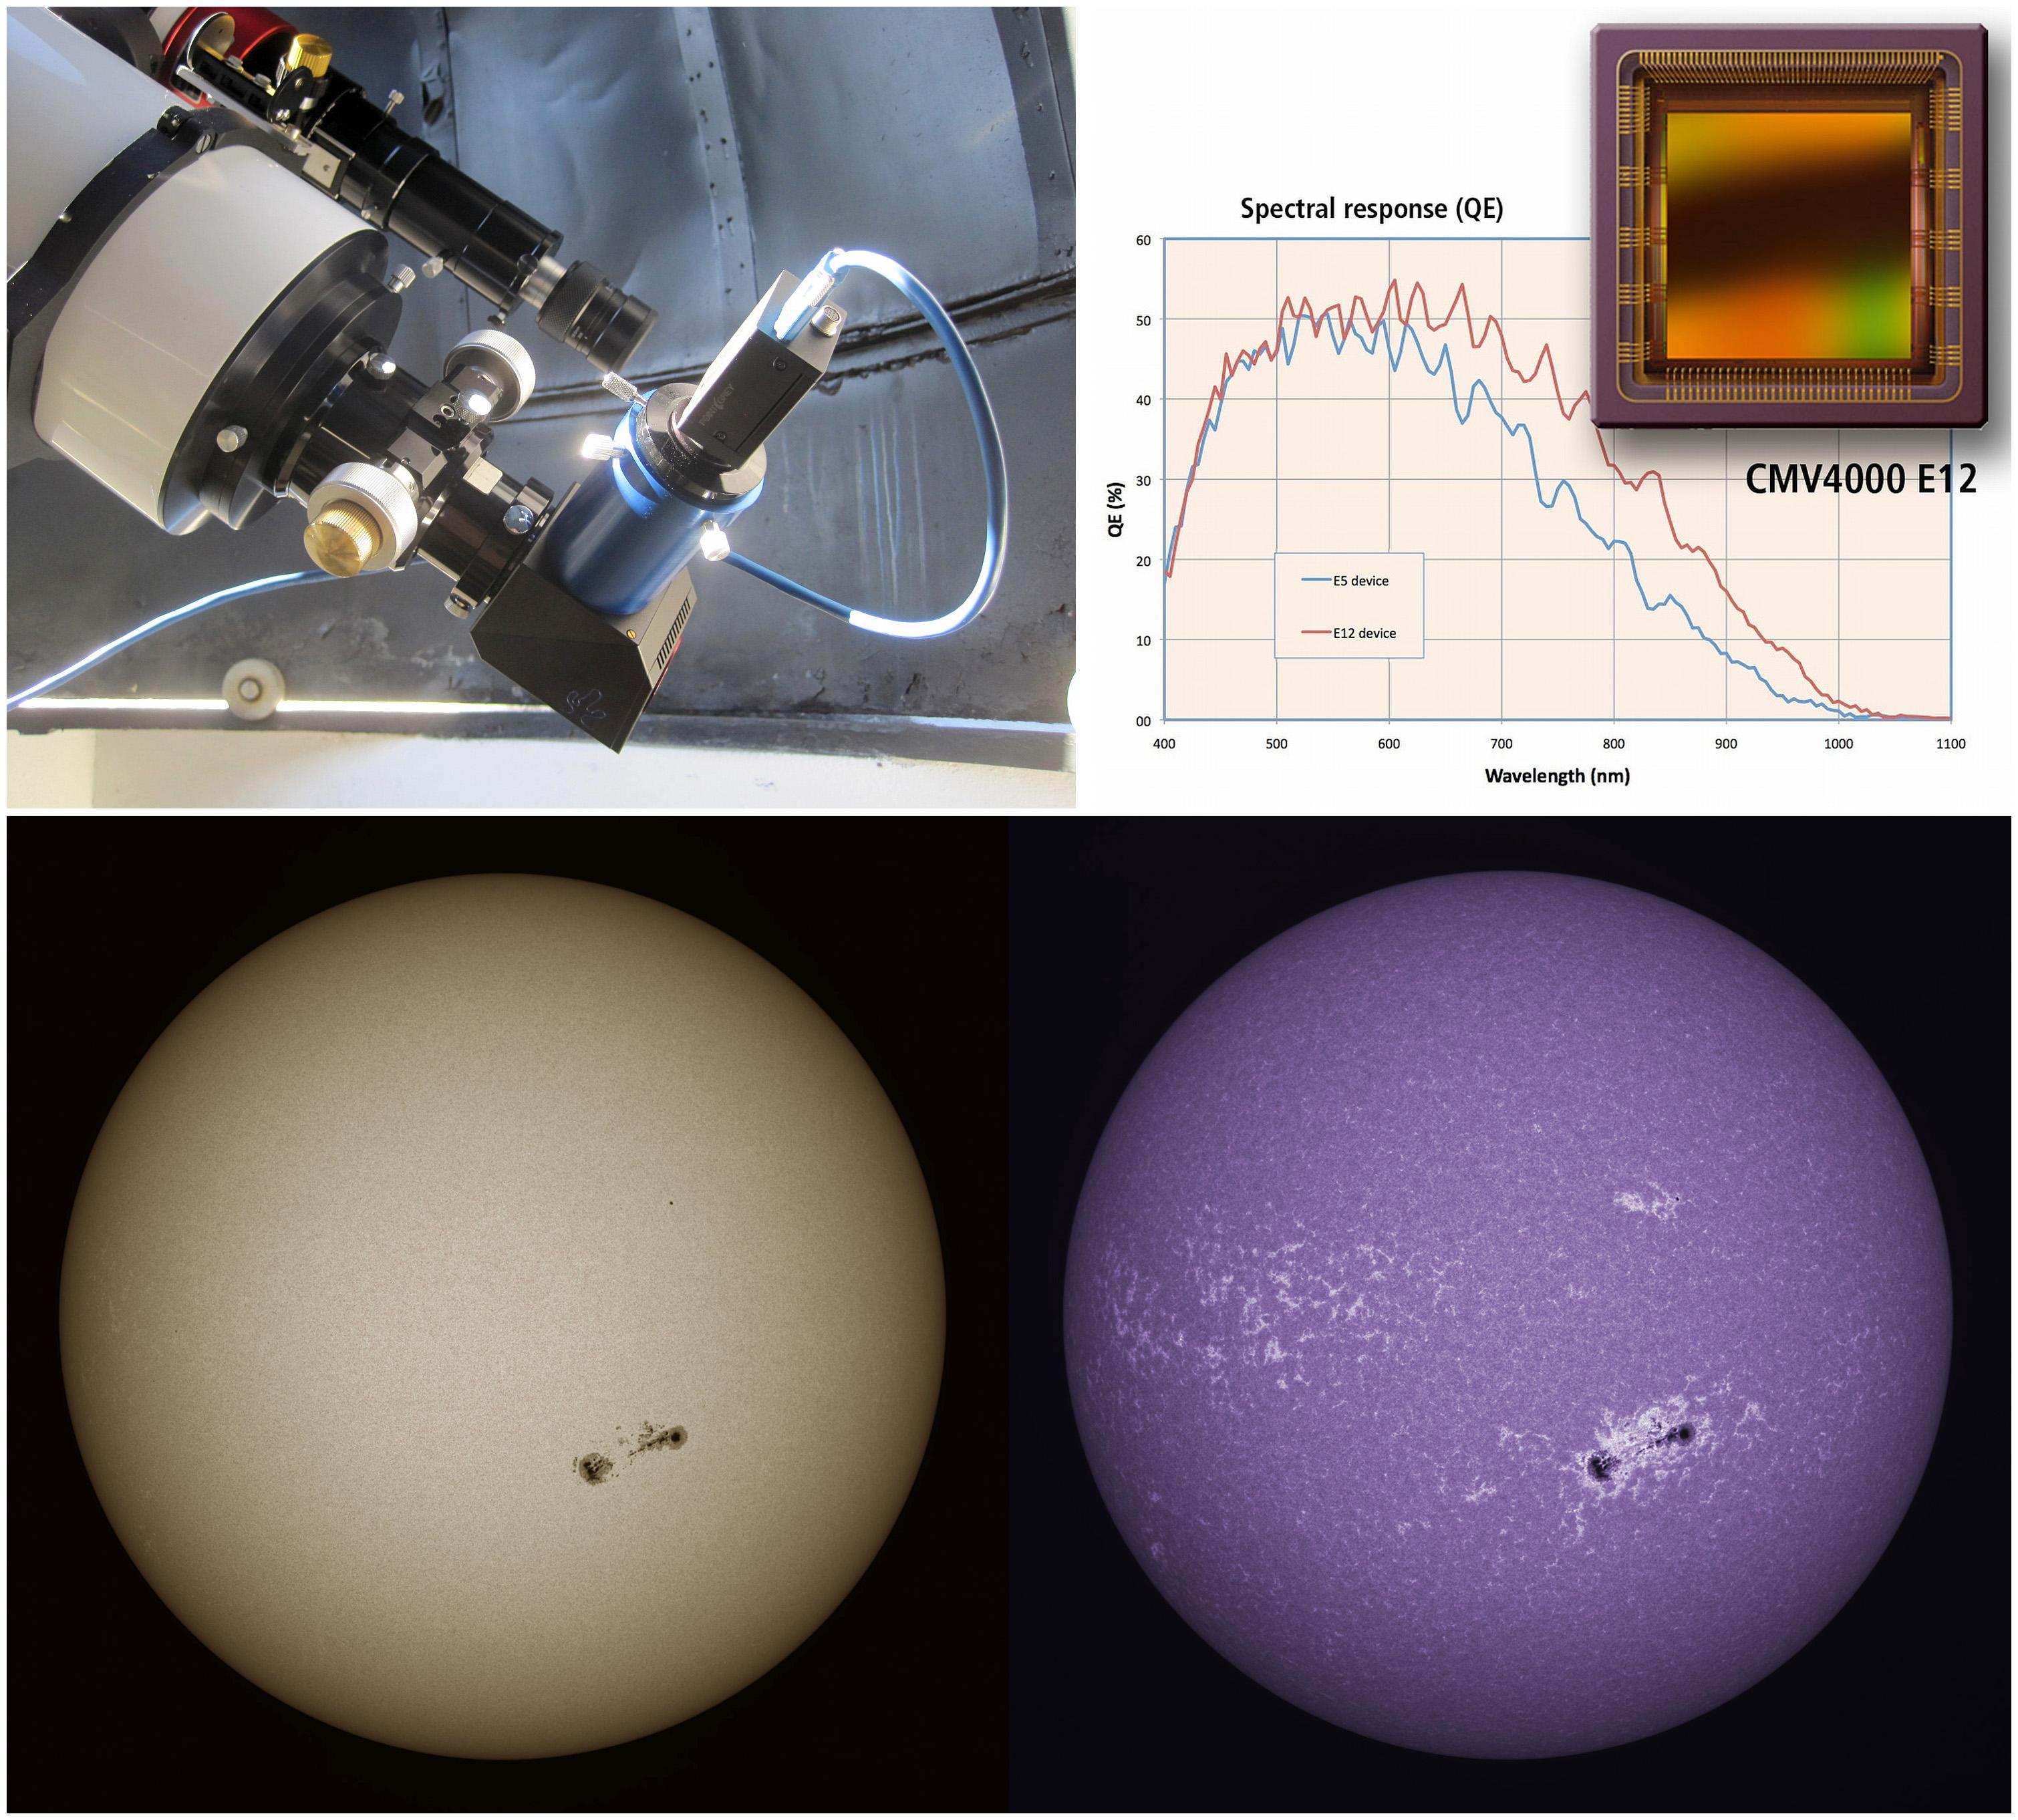 solar_imaging_session_20150824